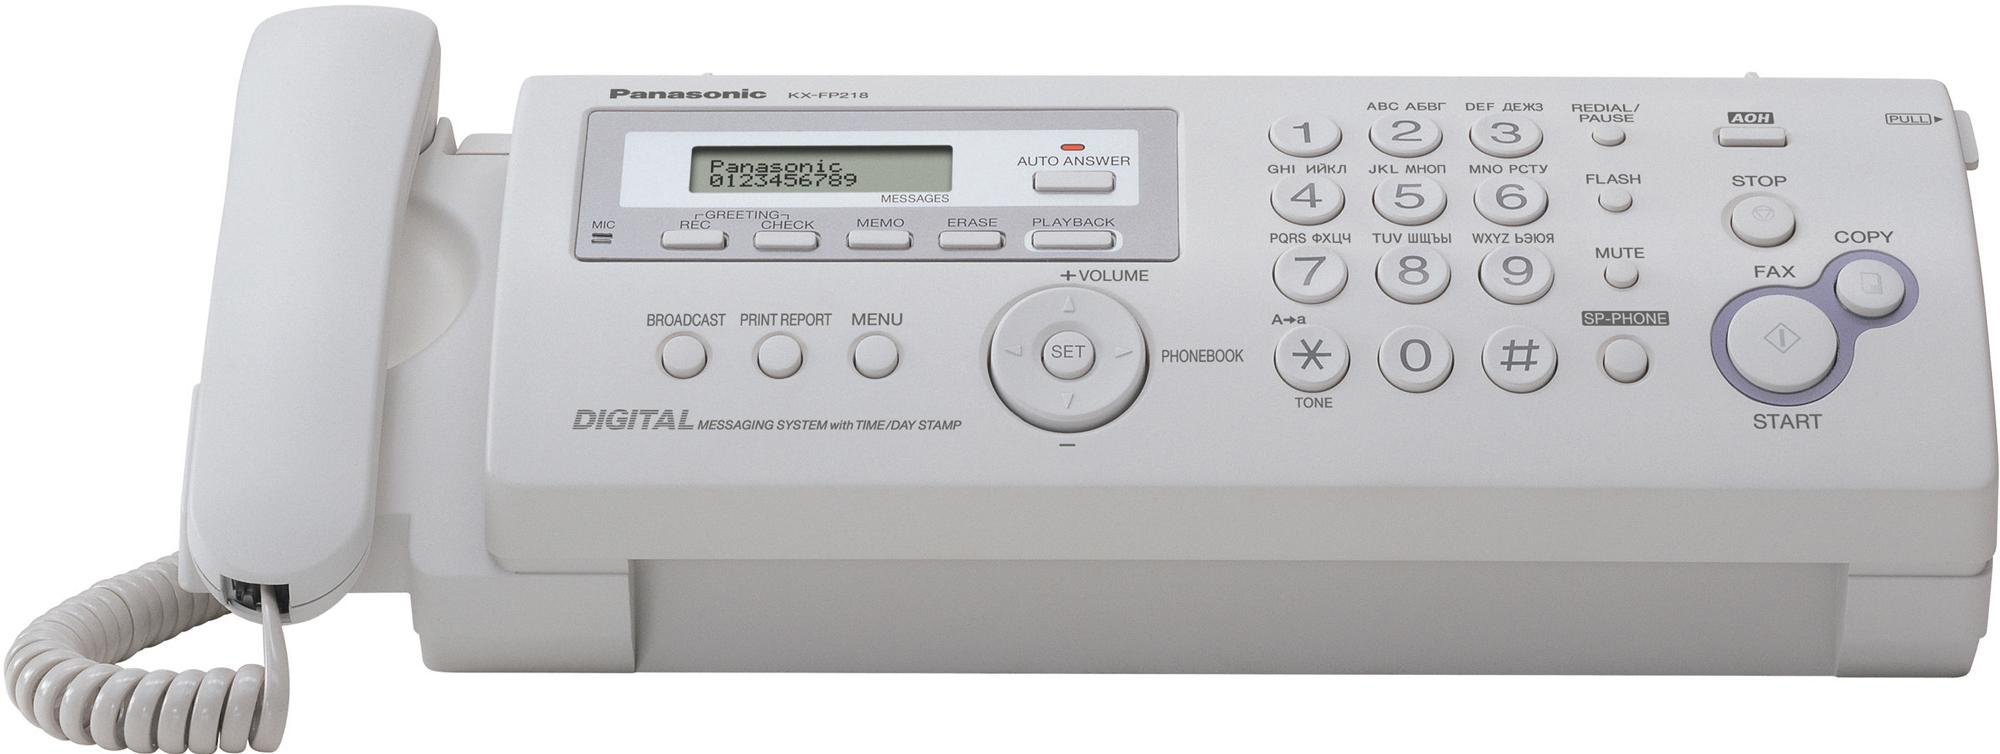 Купить Факс Panasonic, KX-FP218RU, Малайзия